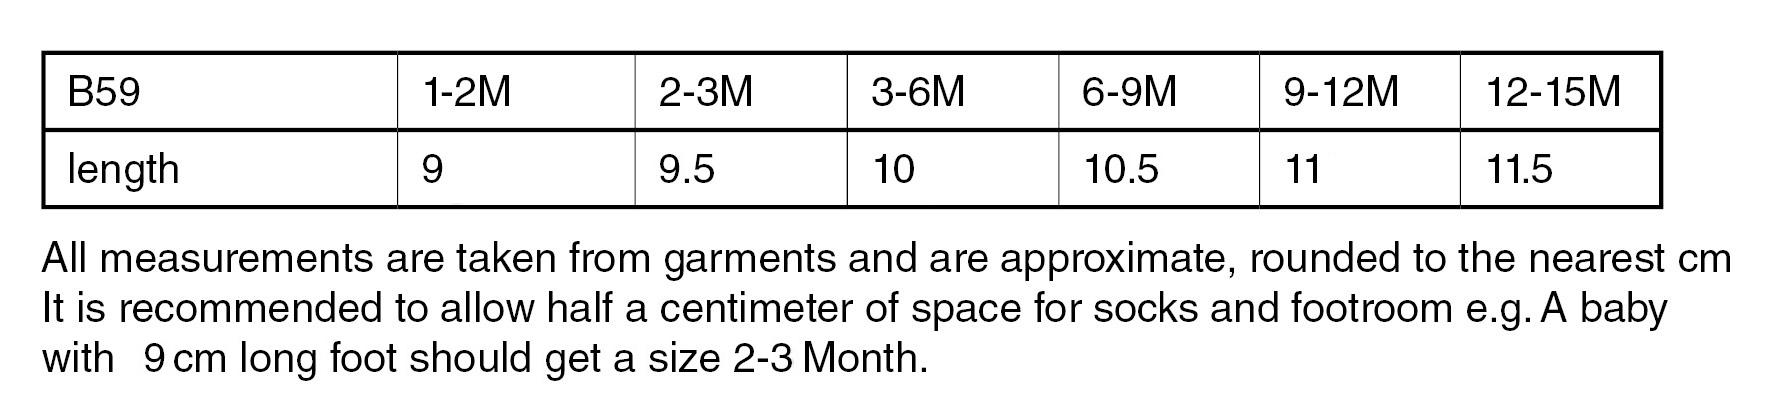 B59 Measurement